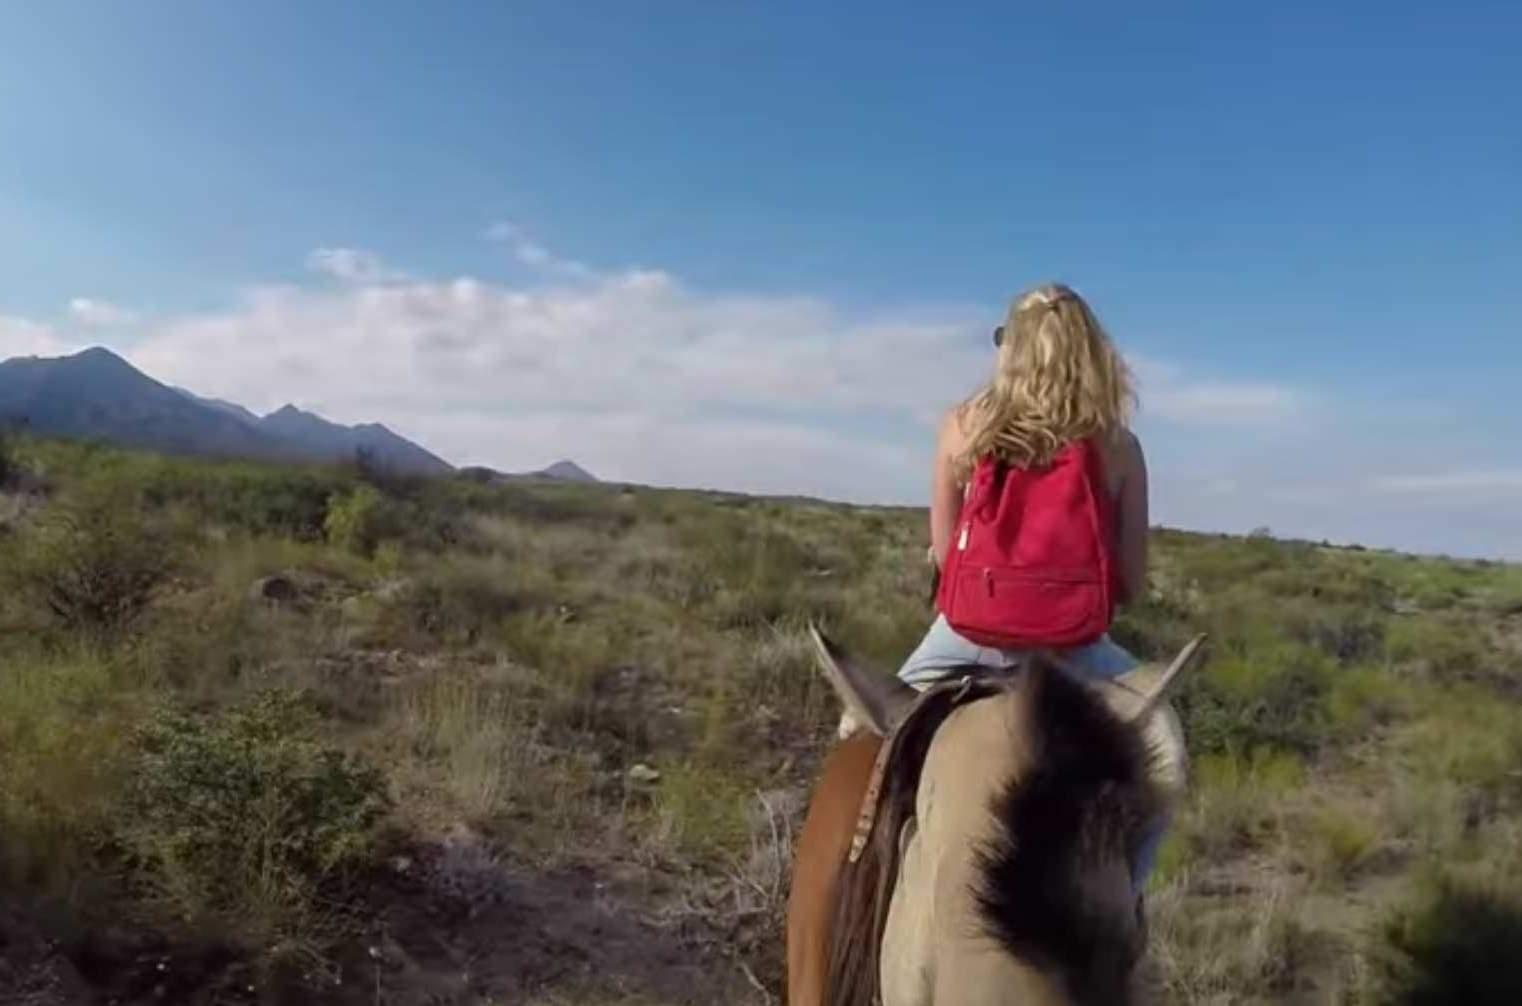 paraguay-nda-haei-ov-horse-ridingB